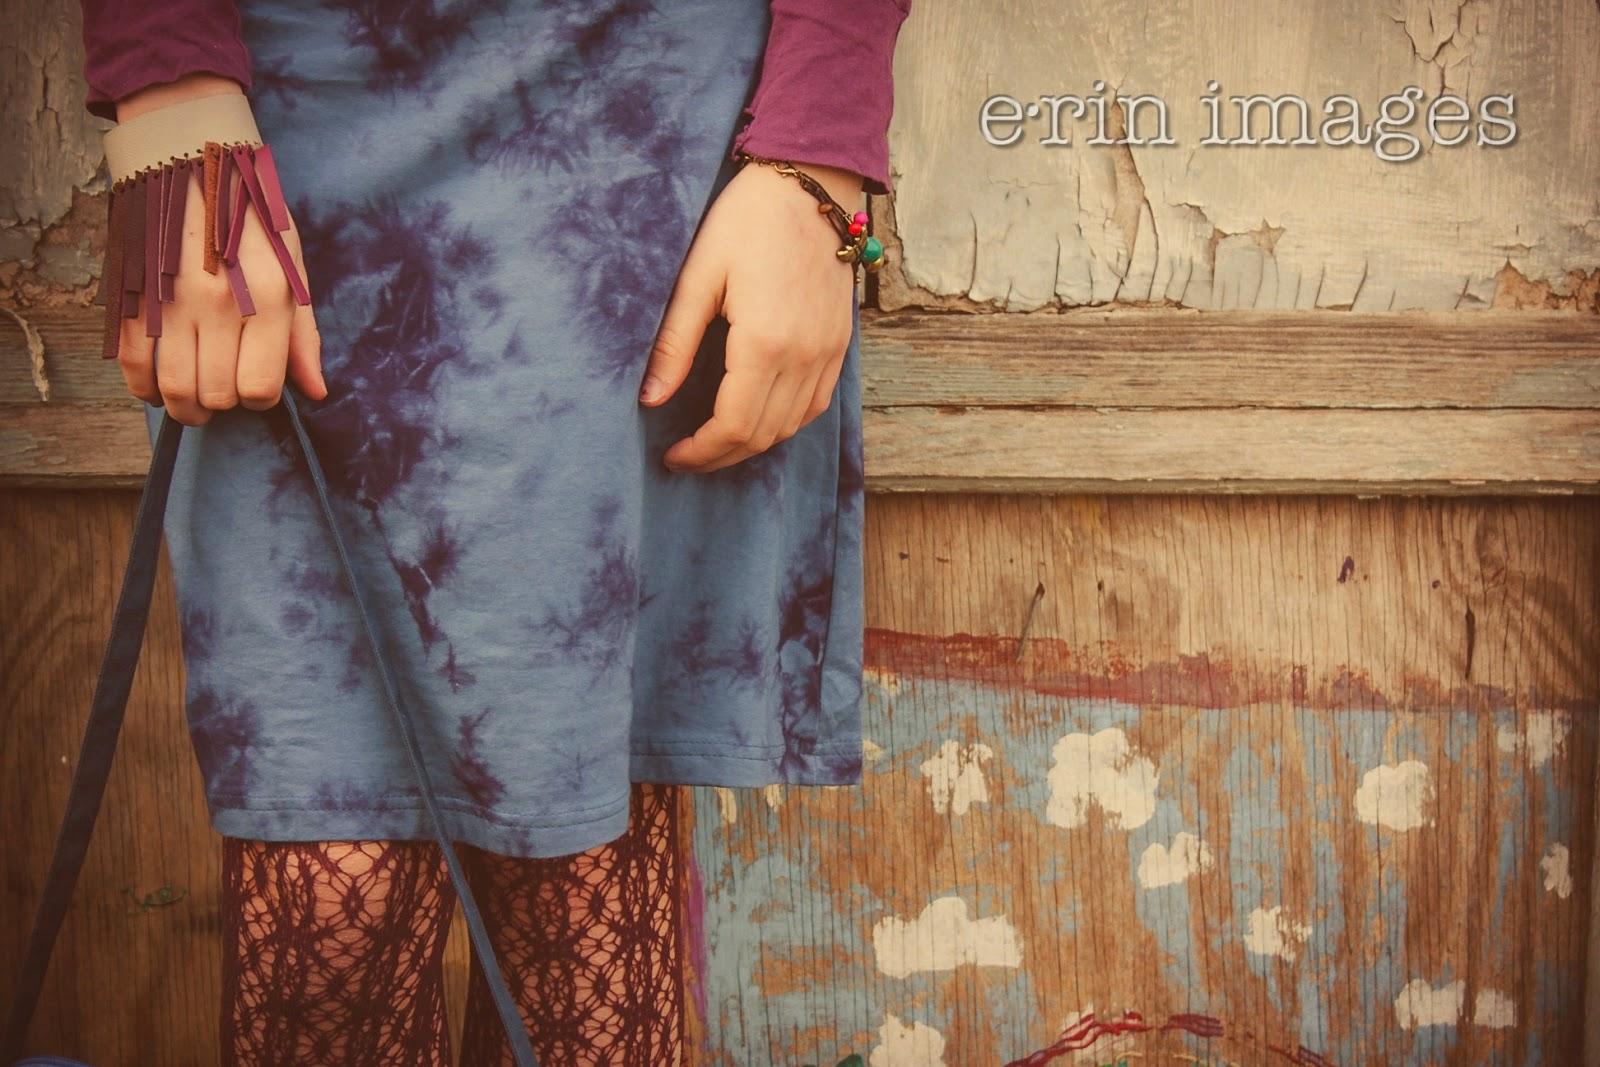 hippie+teen+style - The Retro Vibe of Tie-Dye